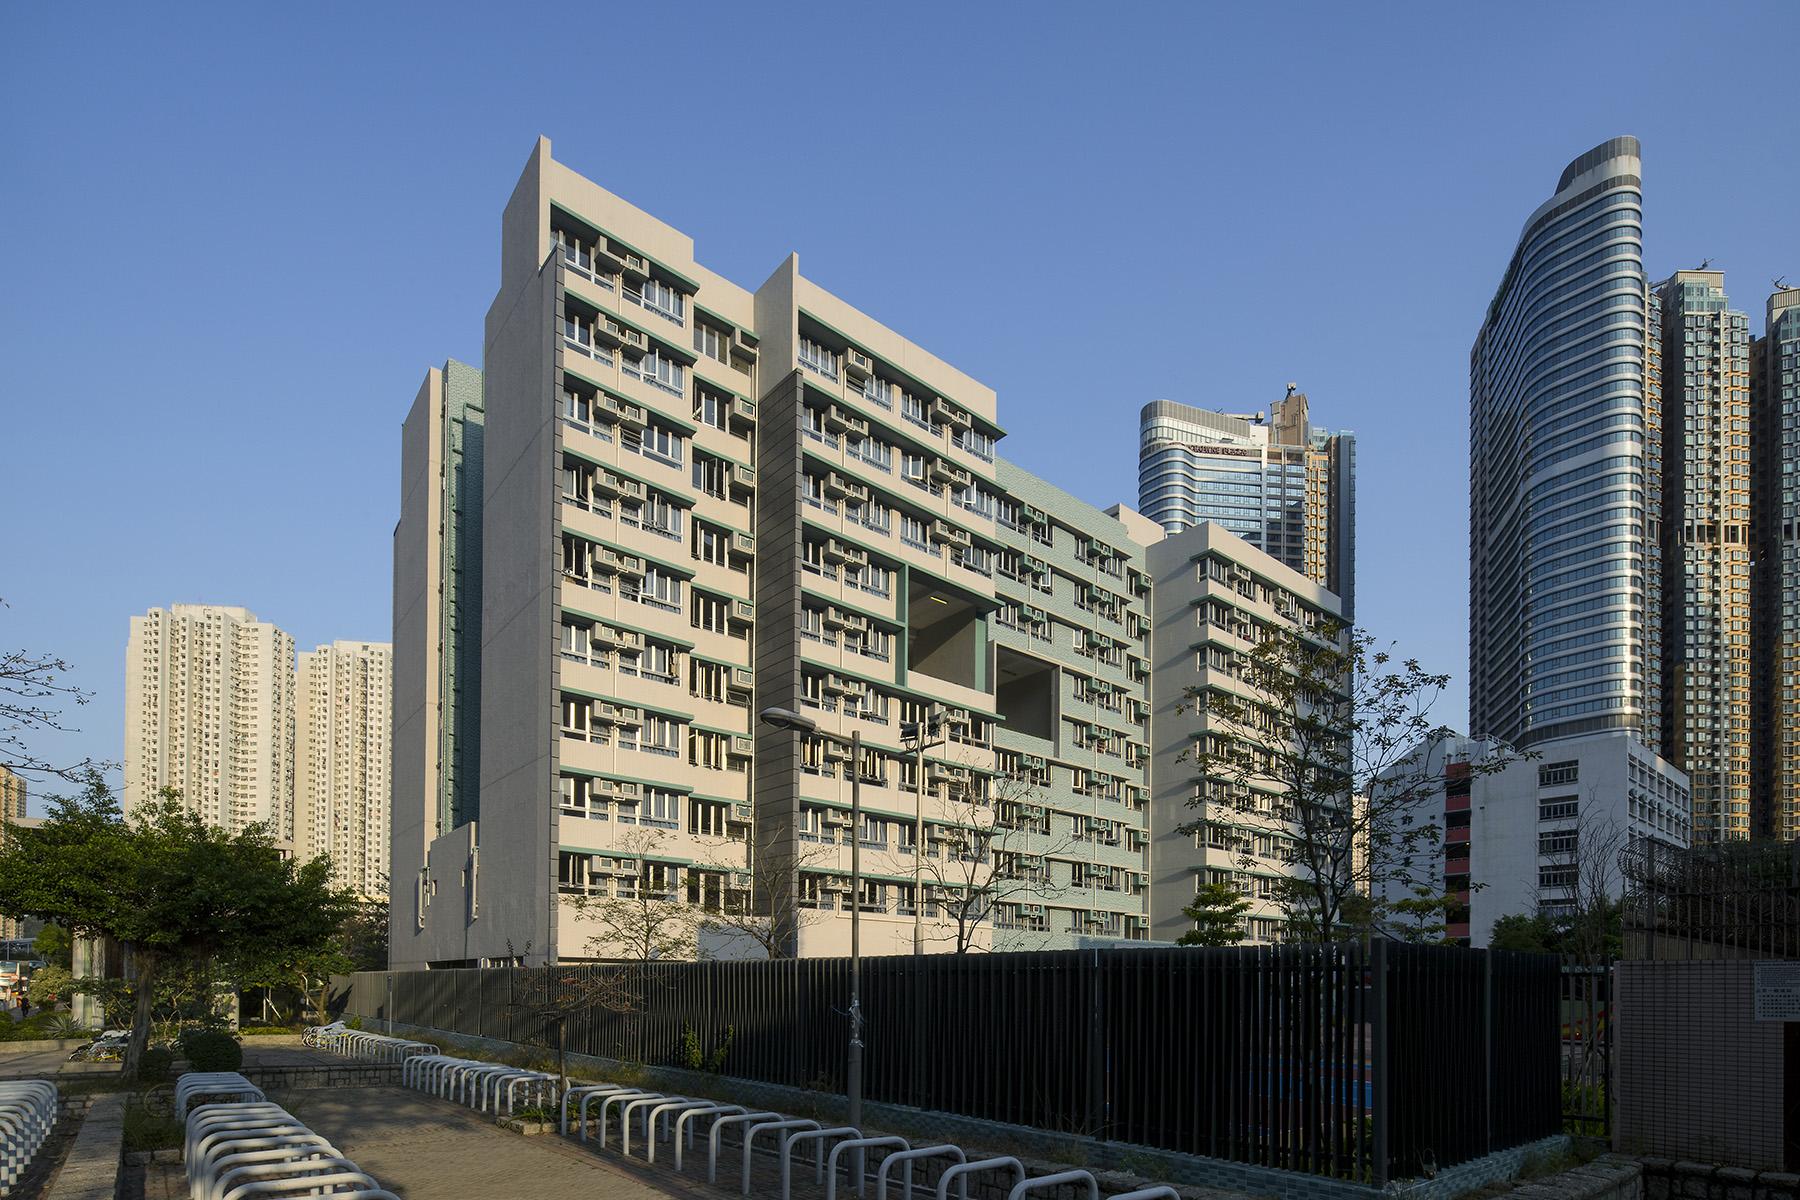 HKUST JOCKEY CLUB HALL, THE HONG KONG UNIVERSITY OF SCIENCE & TECHNOLOGY